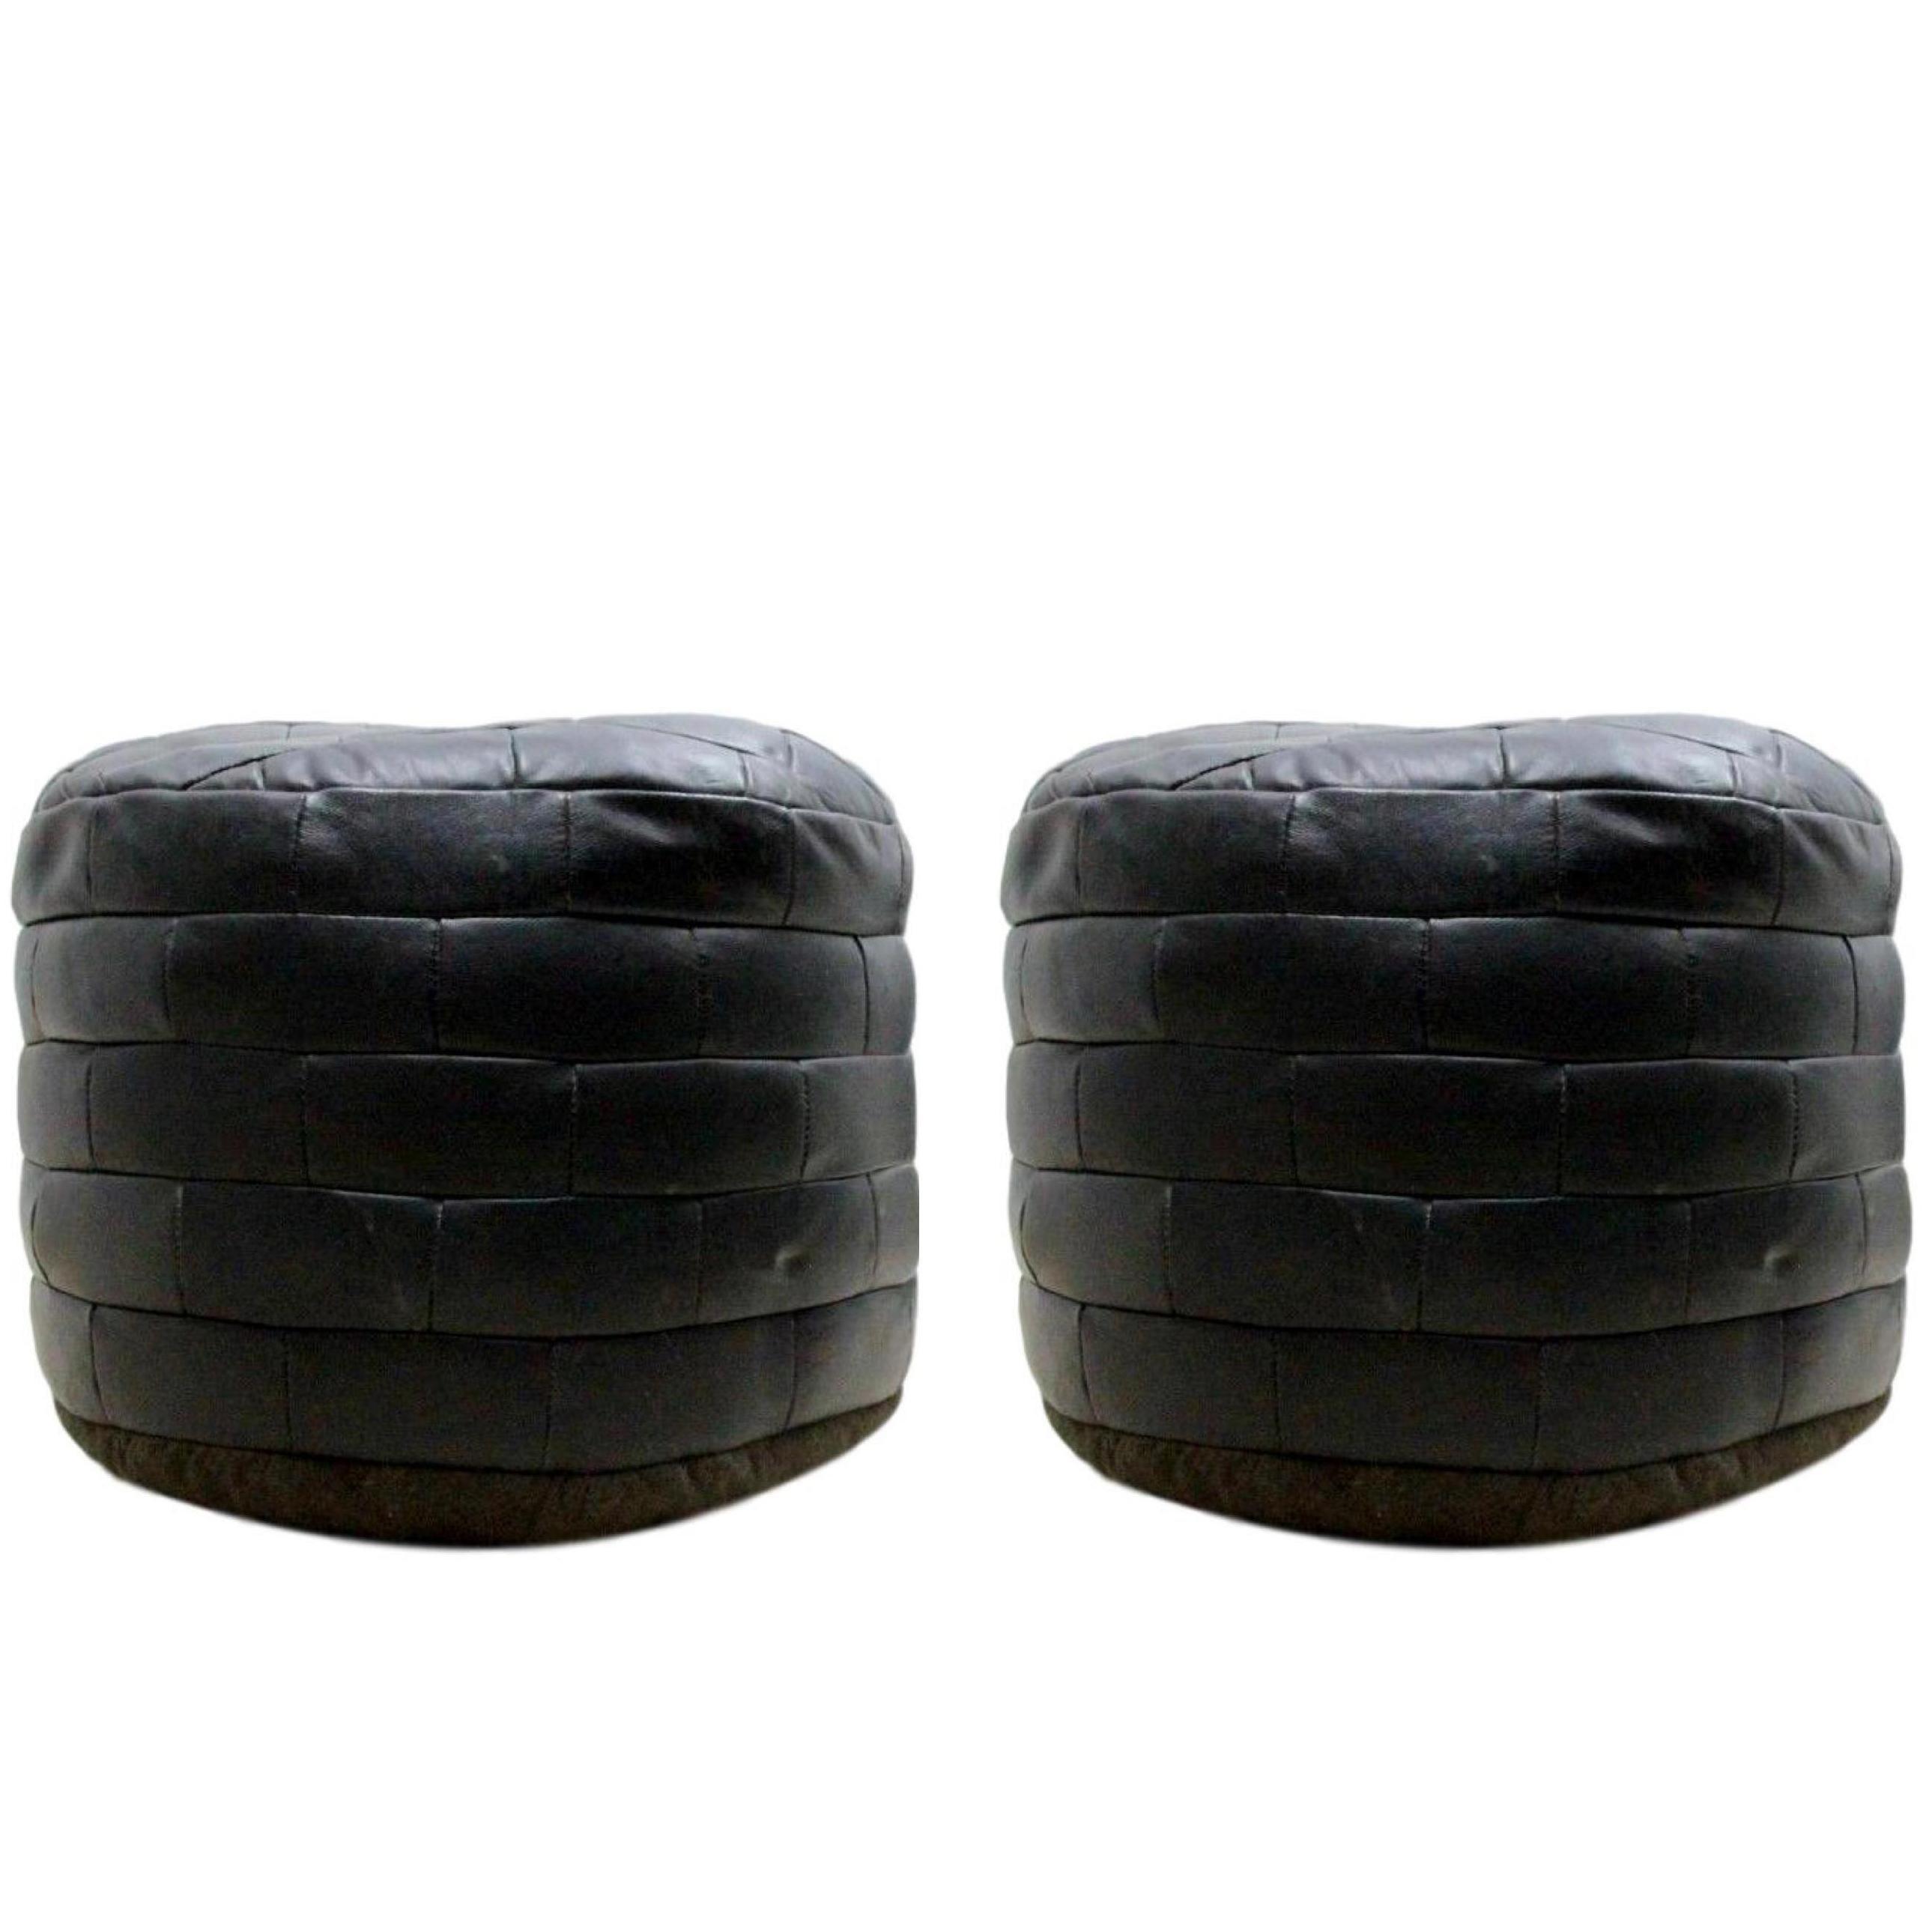 Awesome De Sede Patchwork Black Leather Ottomans At 1Stdibs Inzonedesignstudio Interior Chair Design Inzonedesignstudiocom